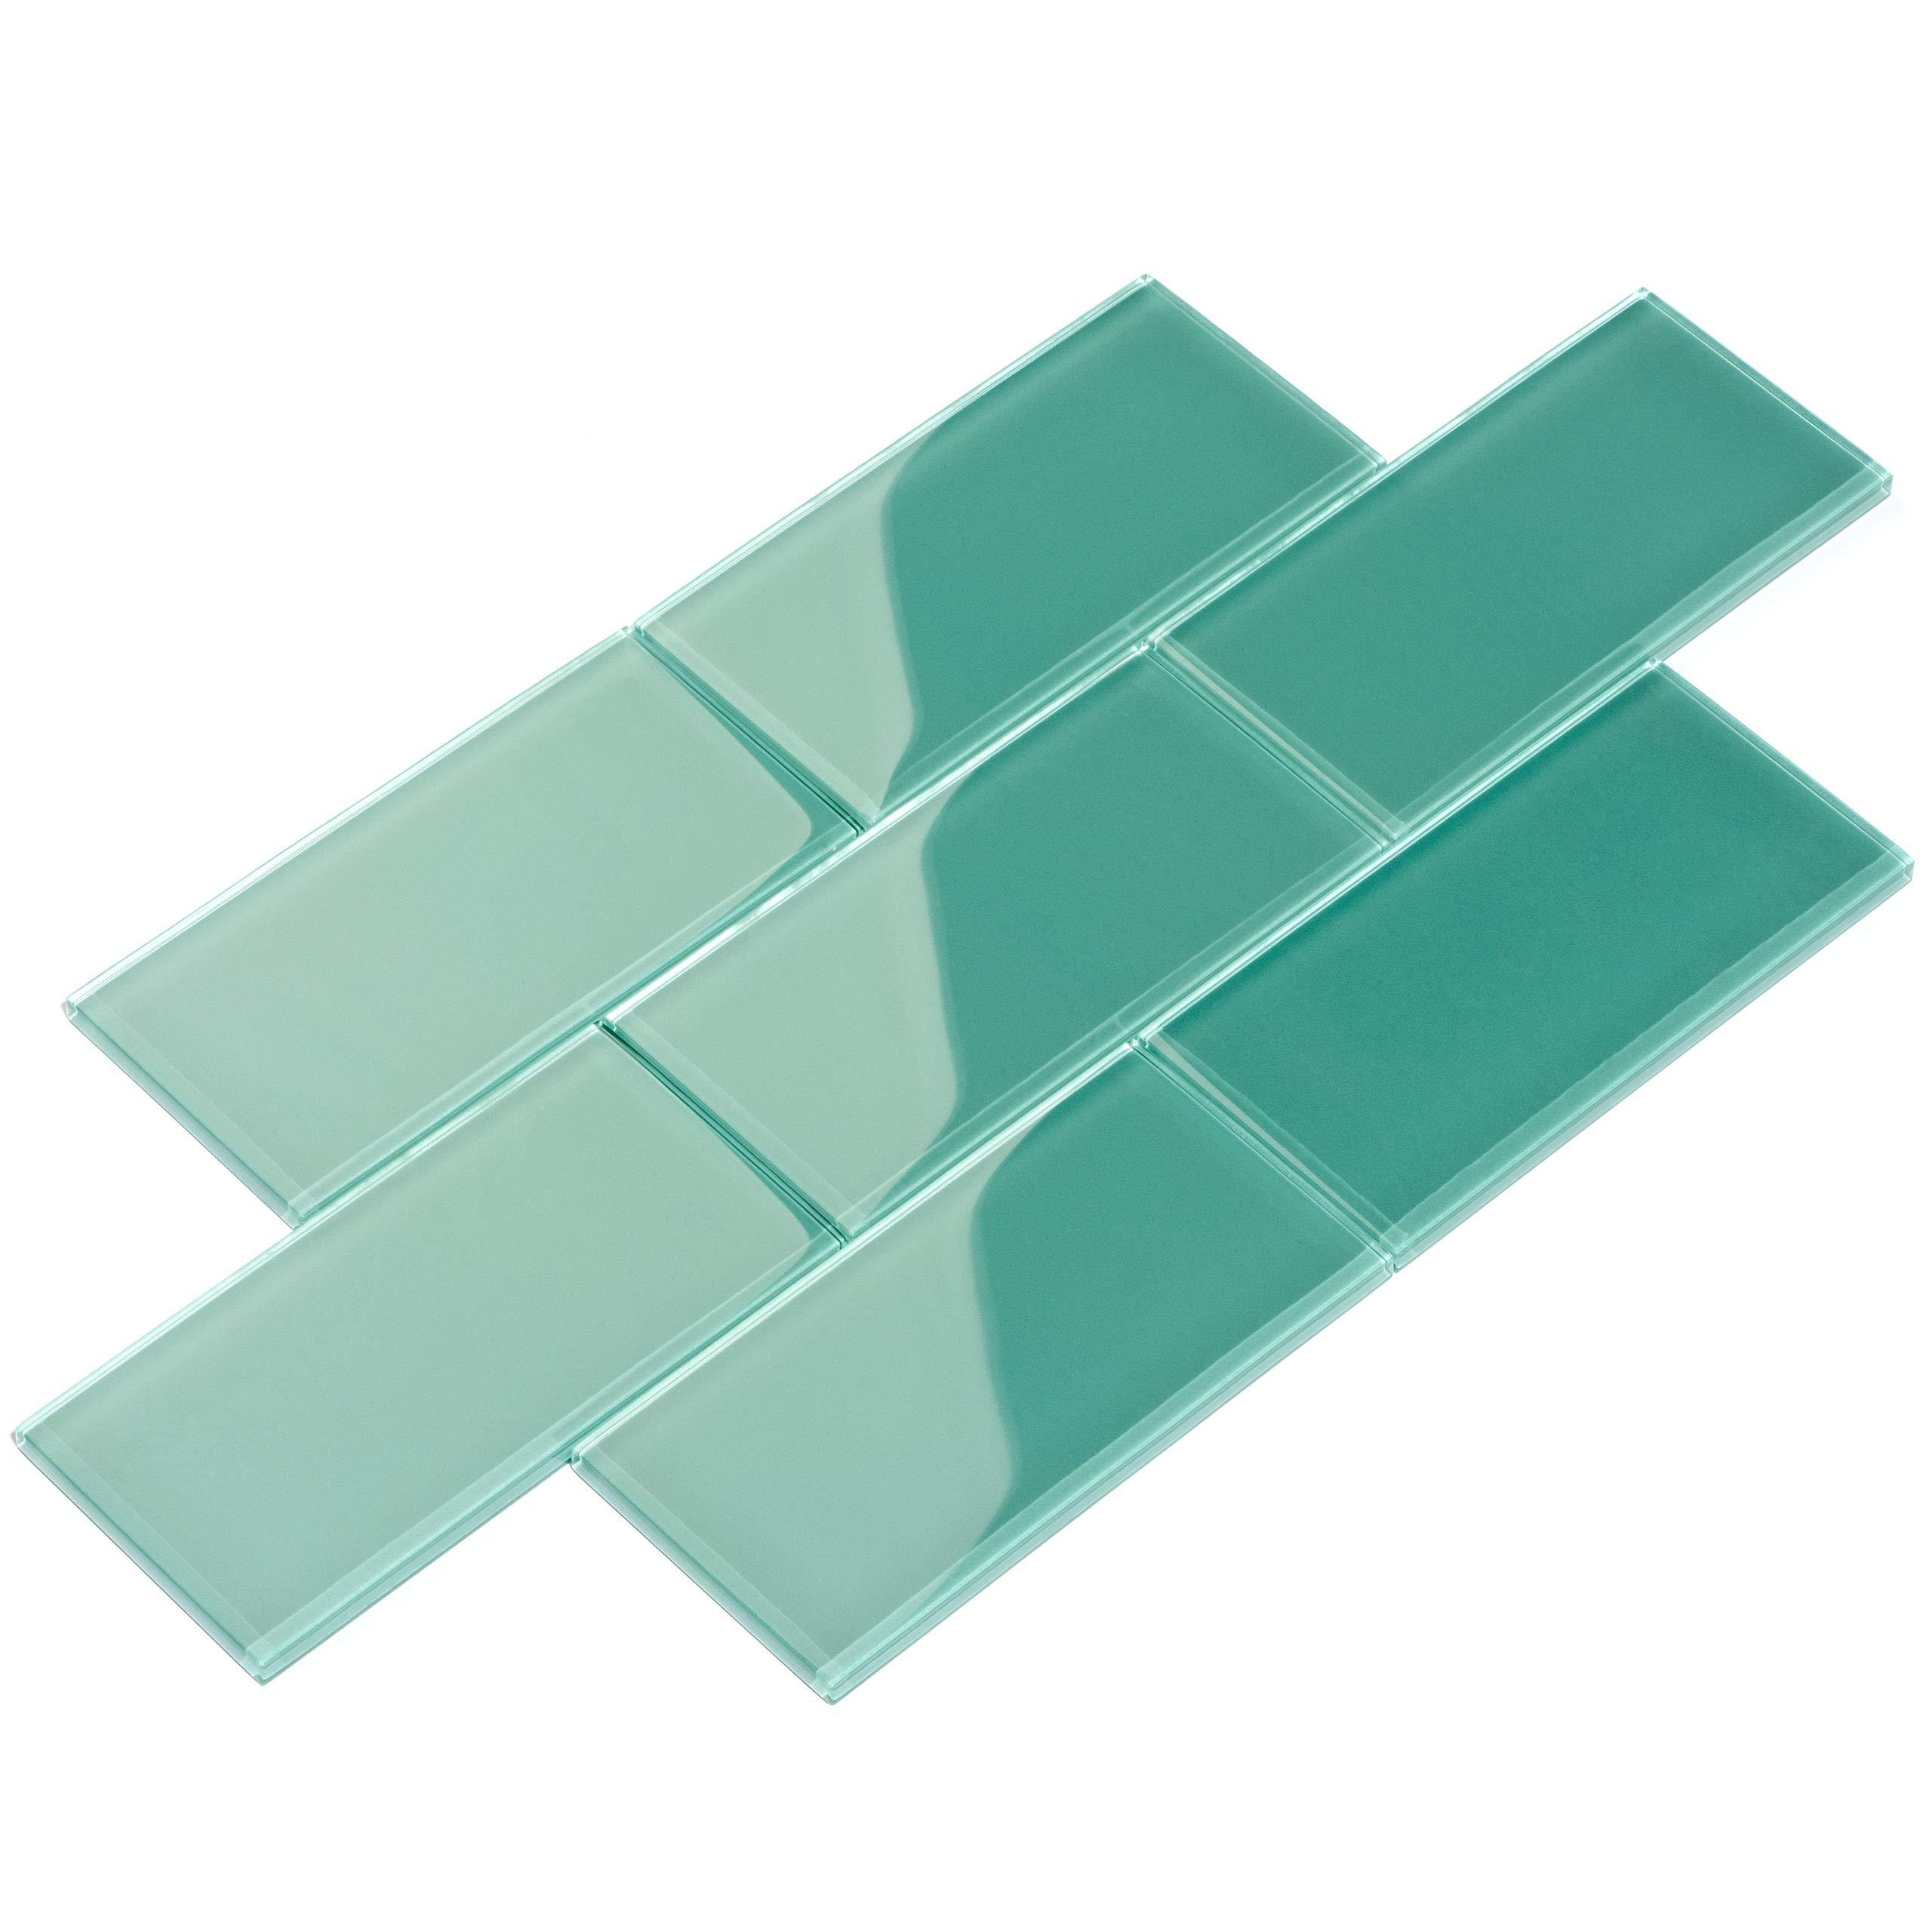 Giorbello Glass Subway Backsplash Tile, 3 x 6, Teal, 2 Sq Ft